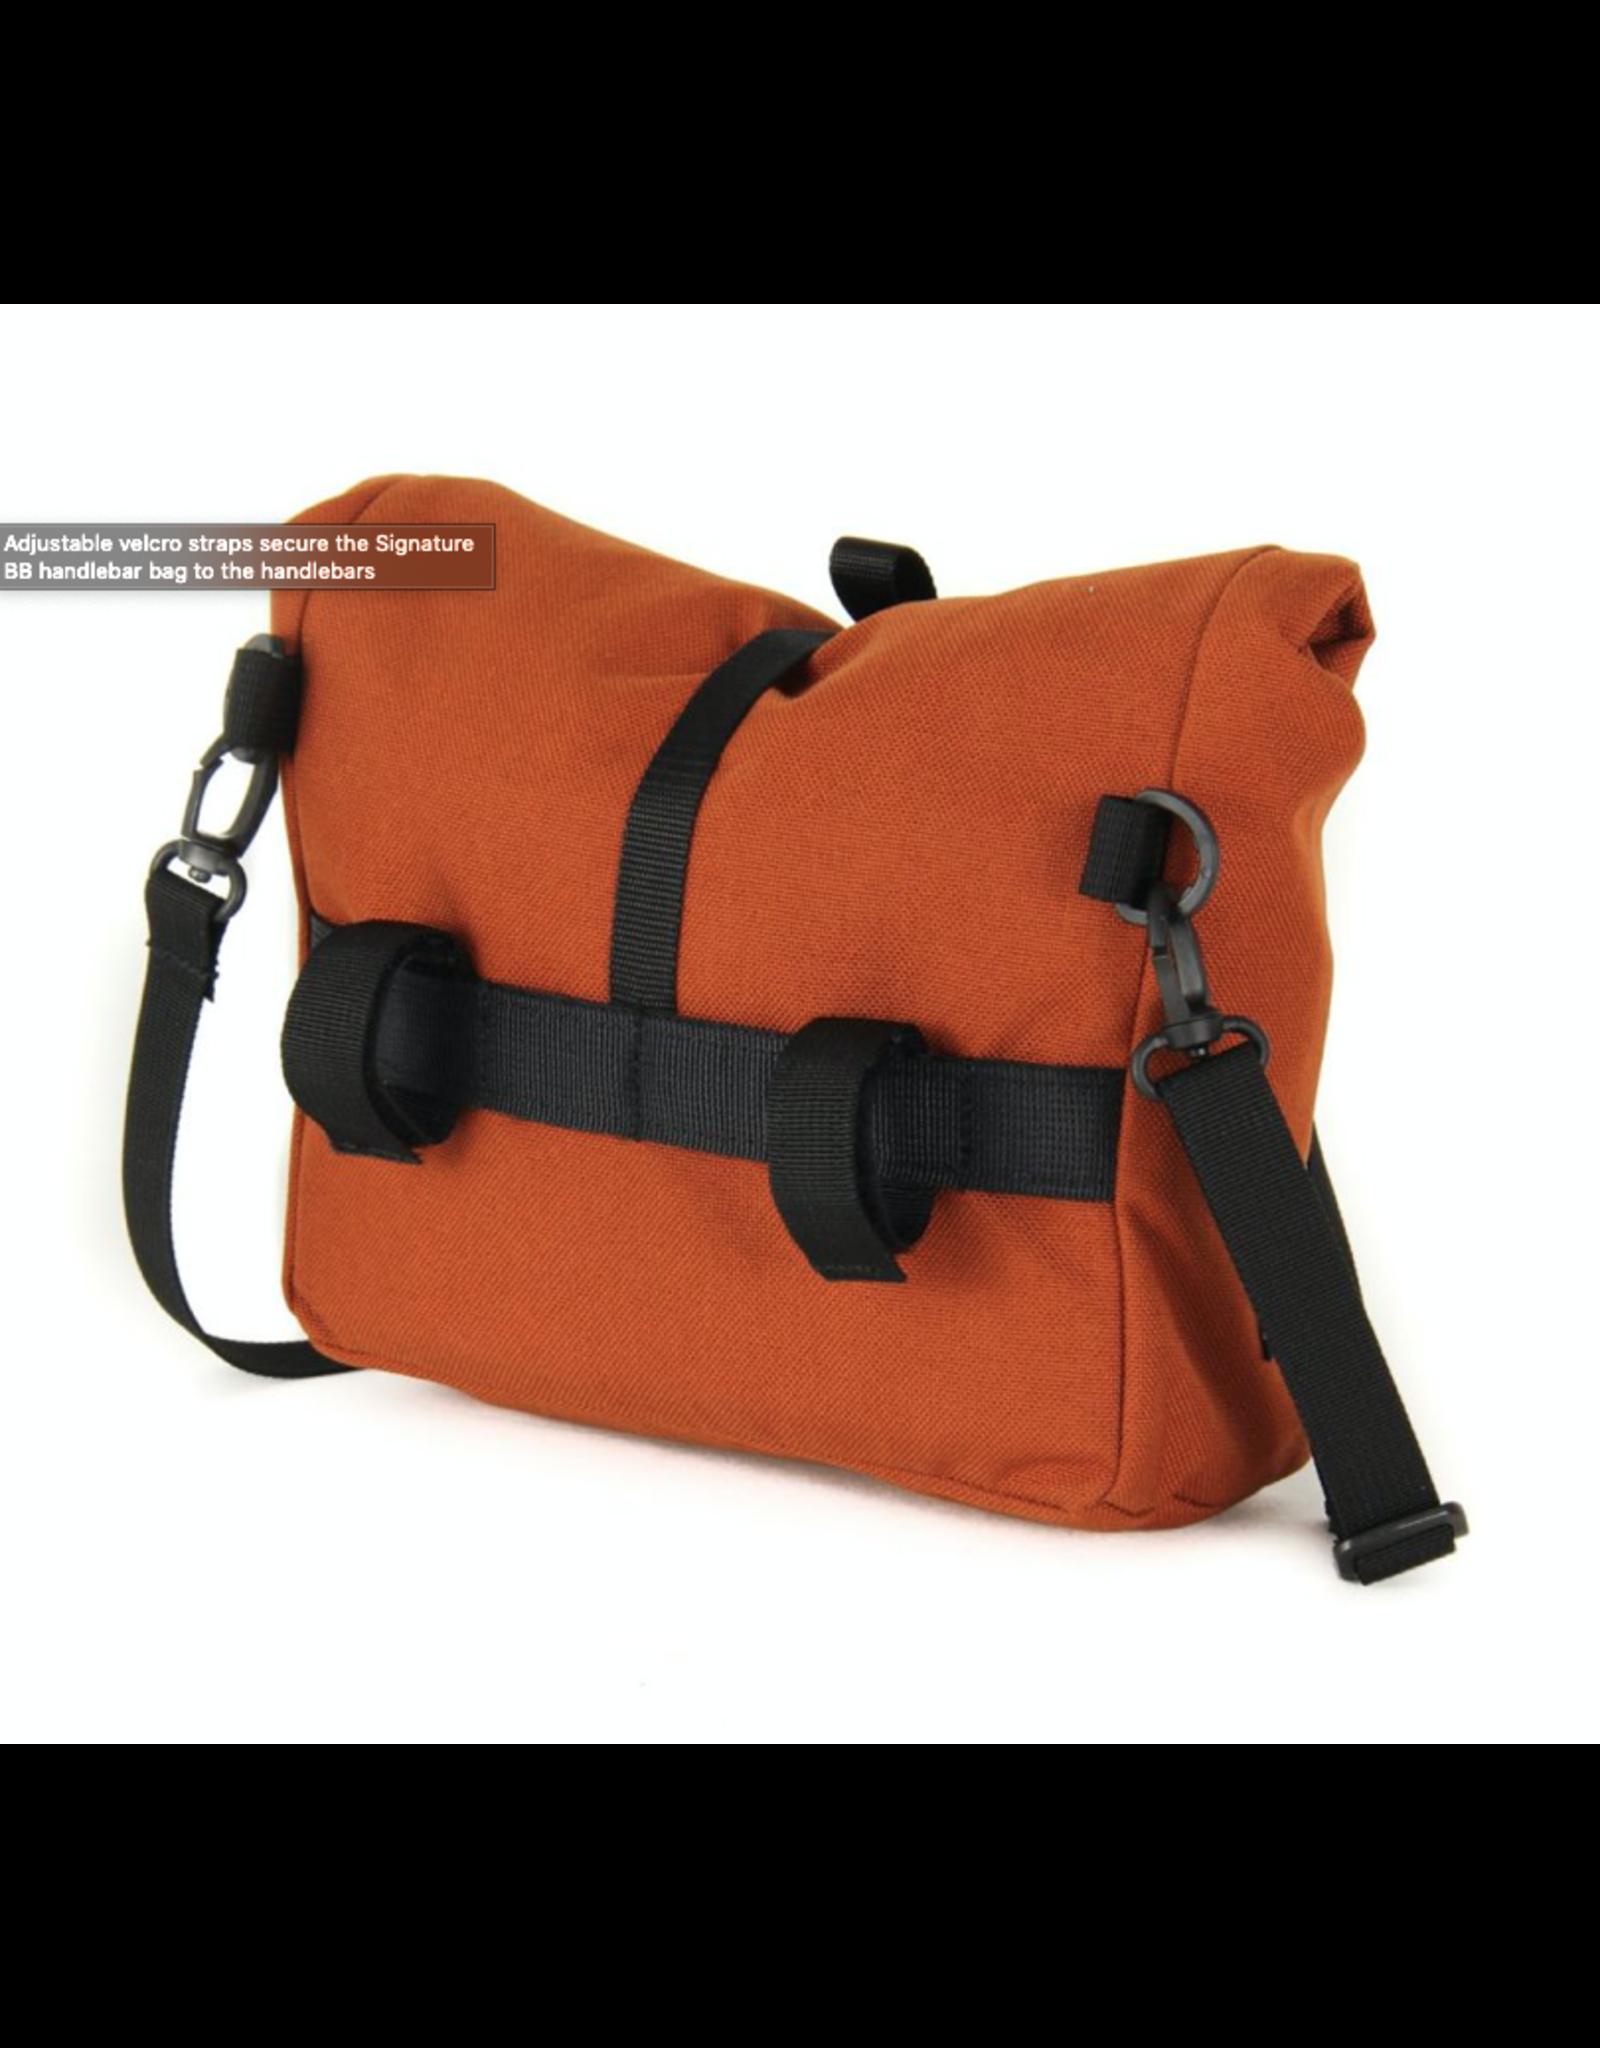 ARKEL Arkel Signature BB Handlebar Bag